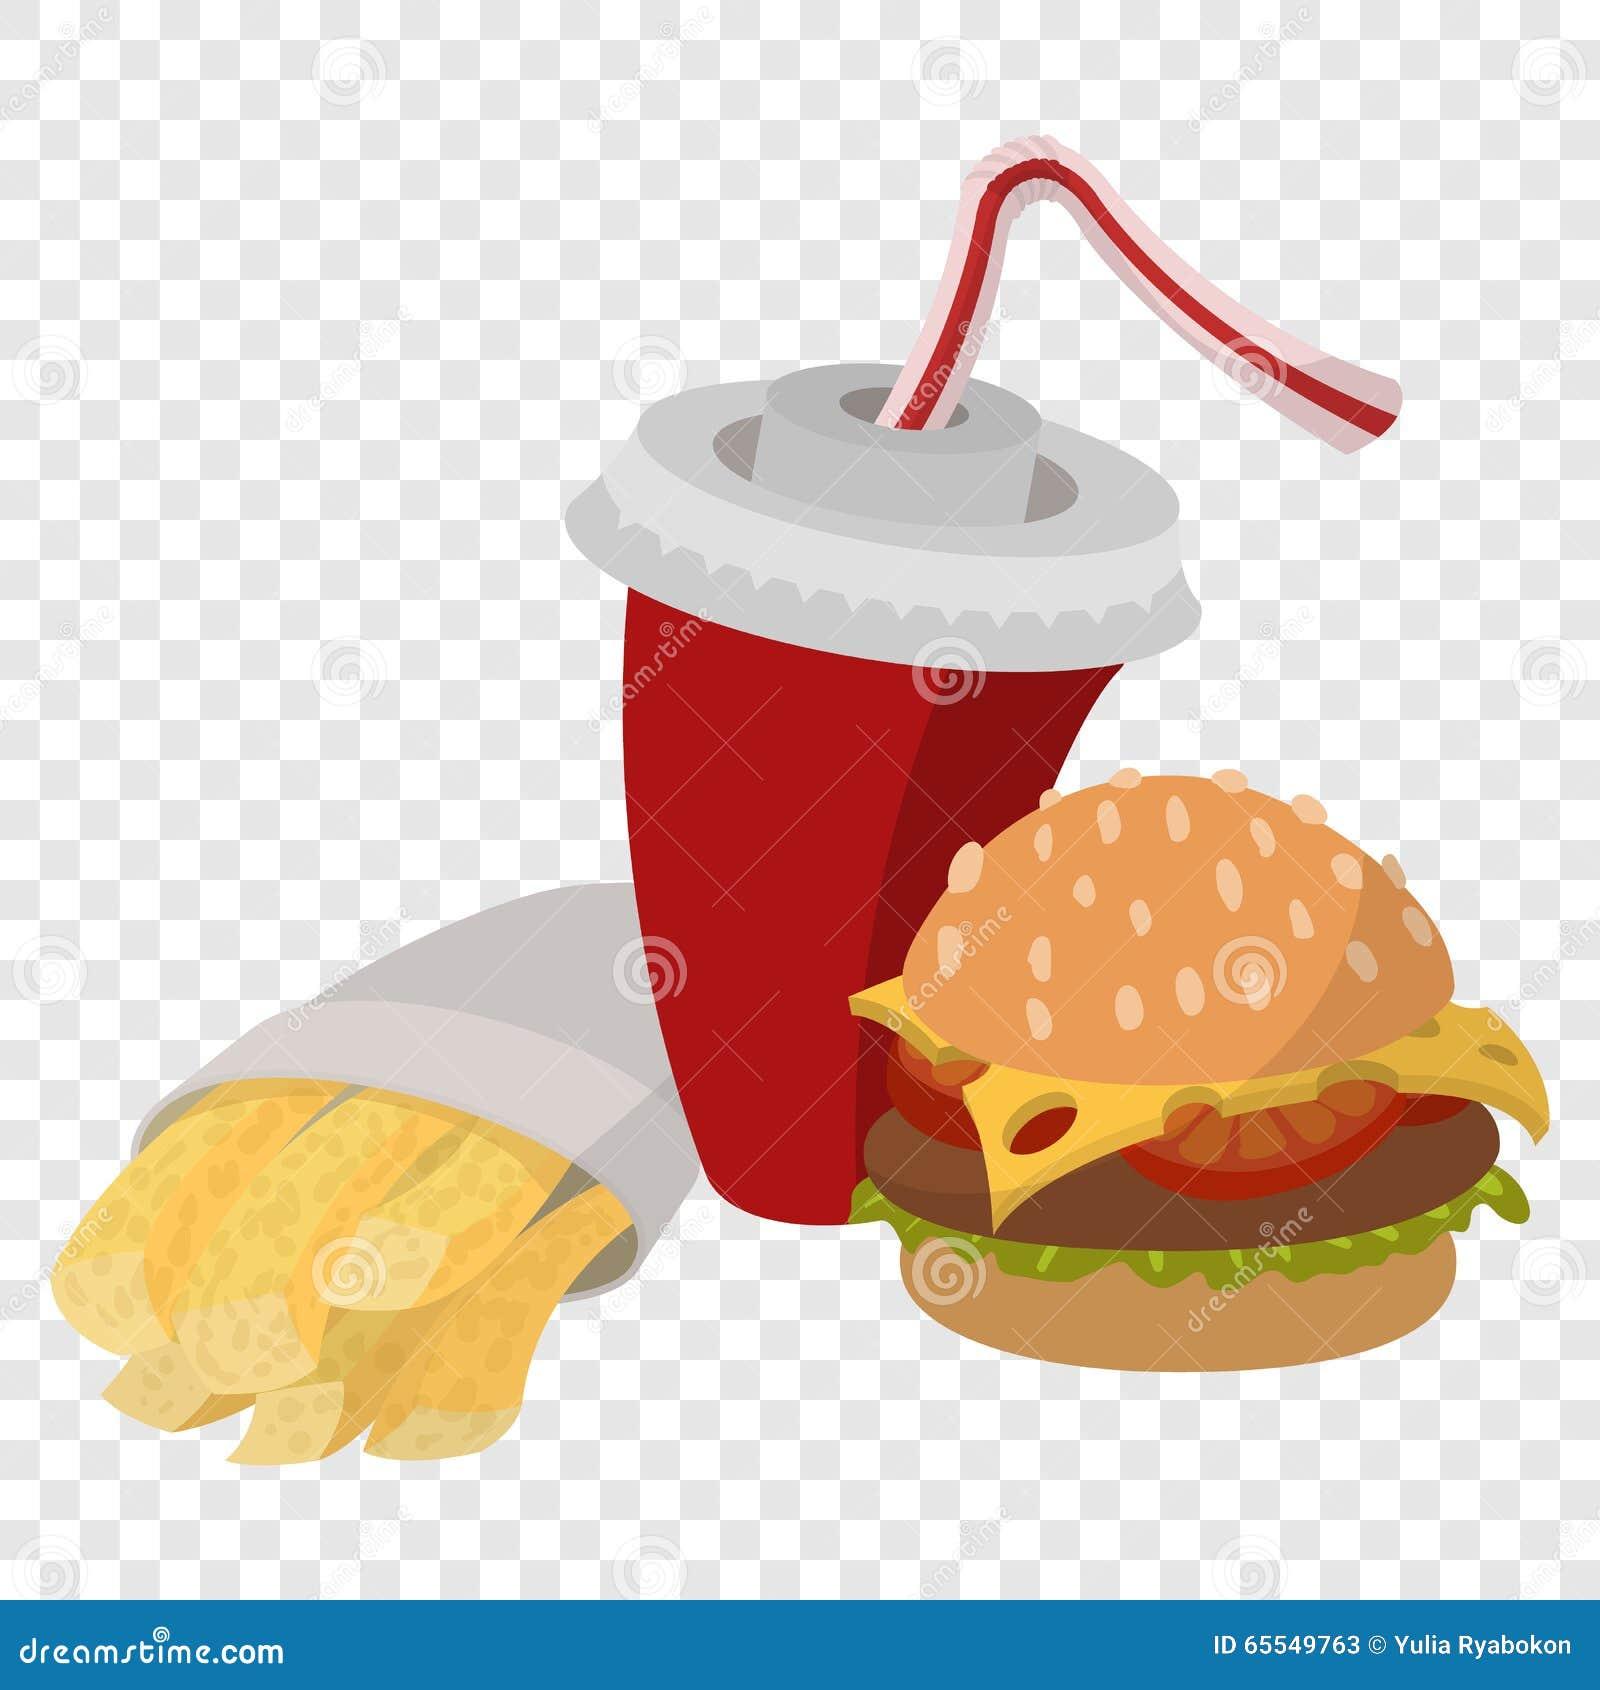 fast food lunch stock vector illustration of fries  menu hamburger clip art images hamburger clip art images free